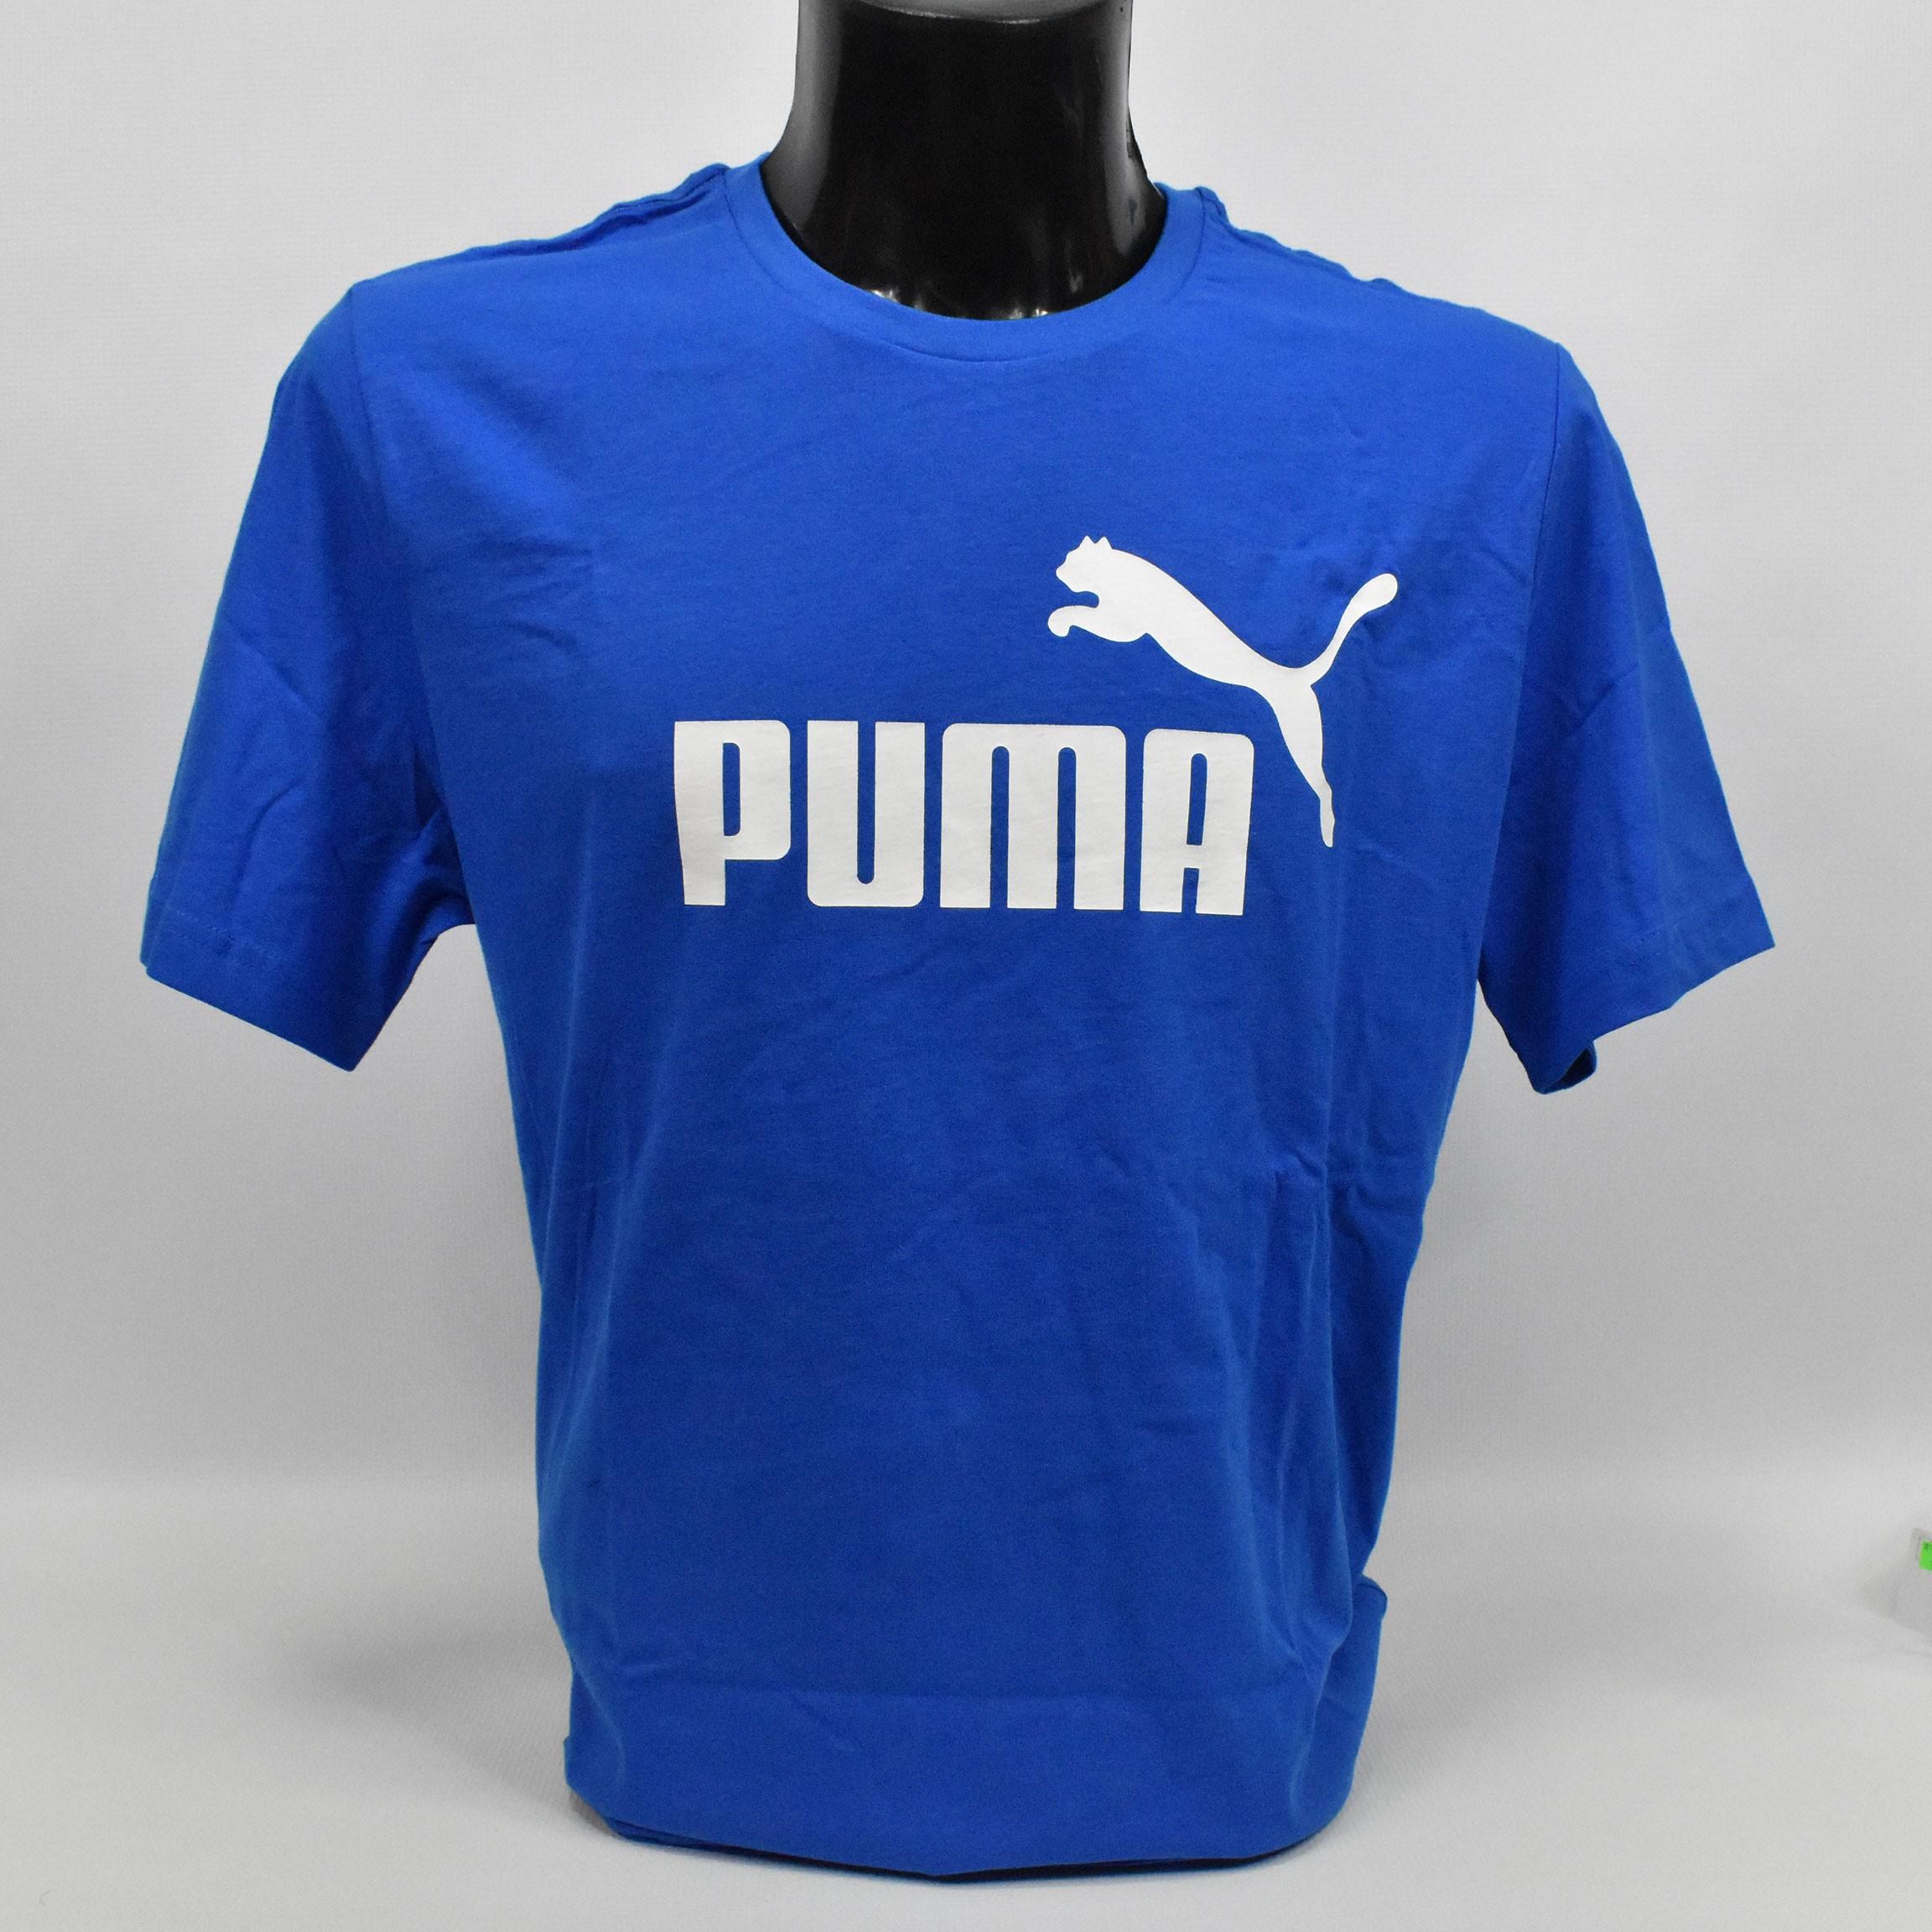 Koszulka Puma - 851740 10 - 1